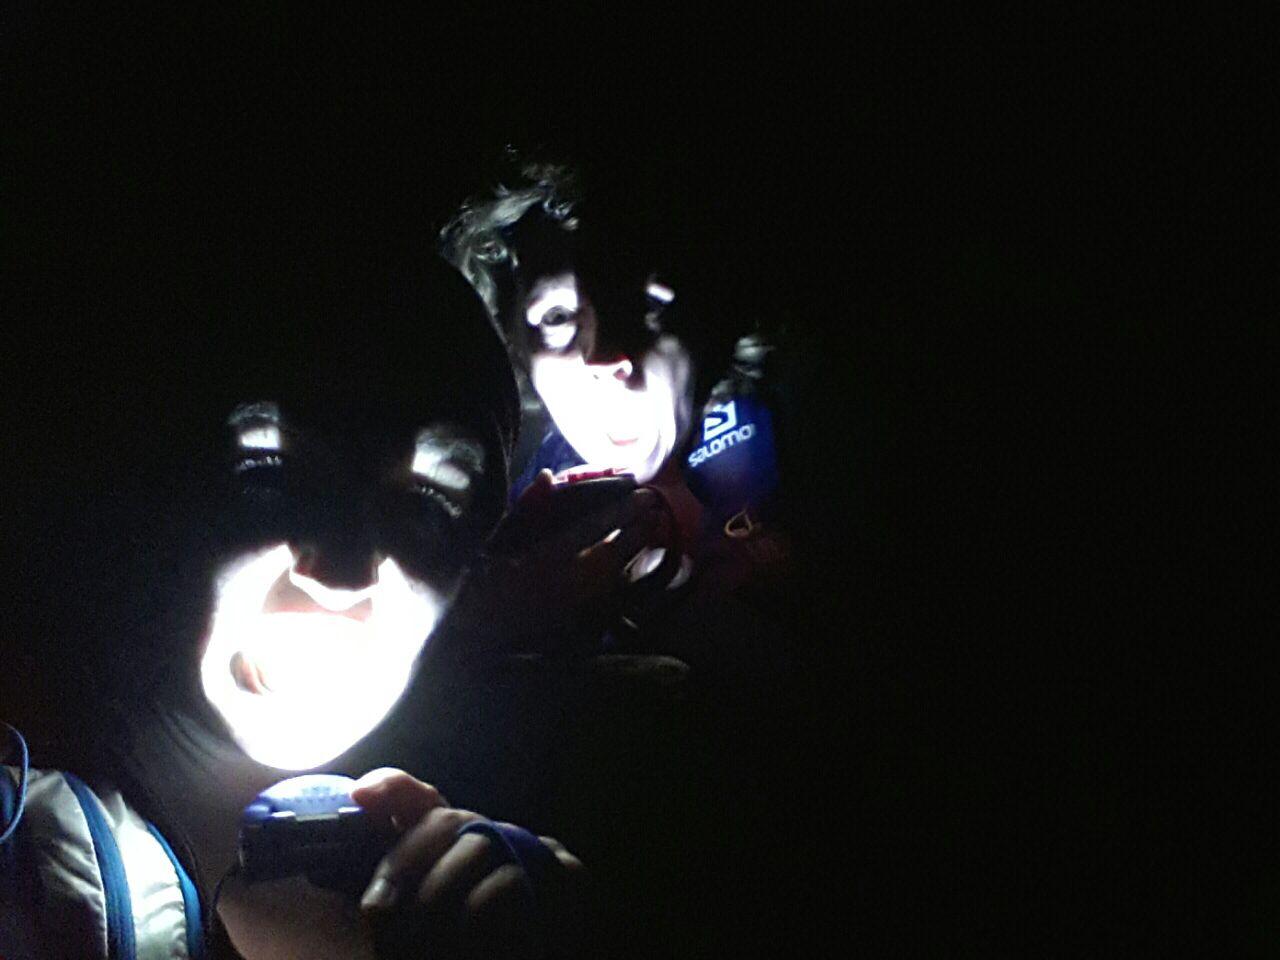 Micro-adventuring -spooky head torch running